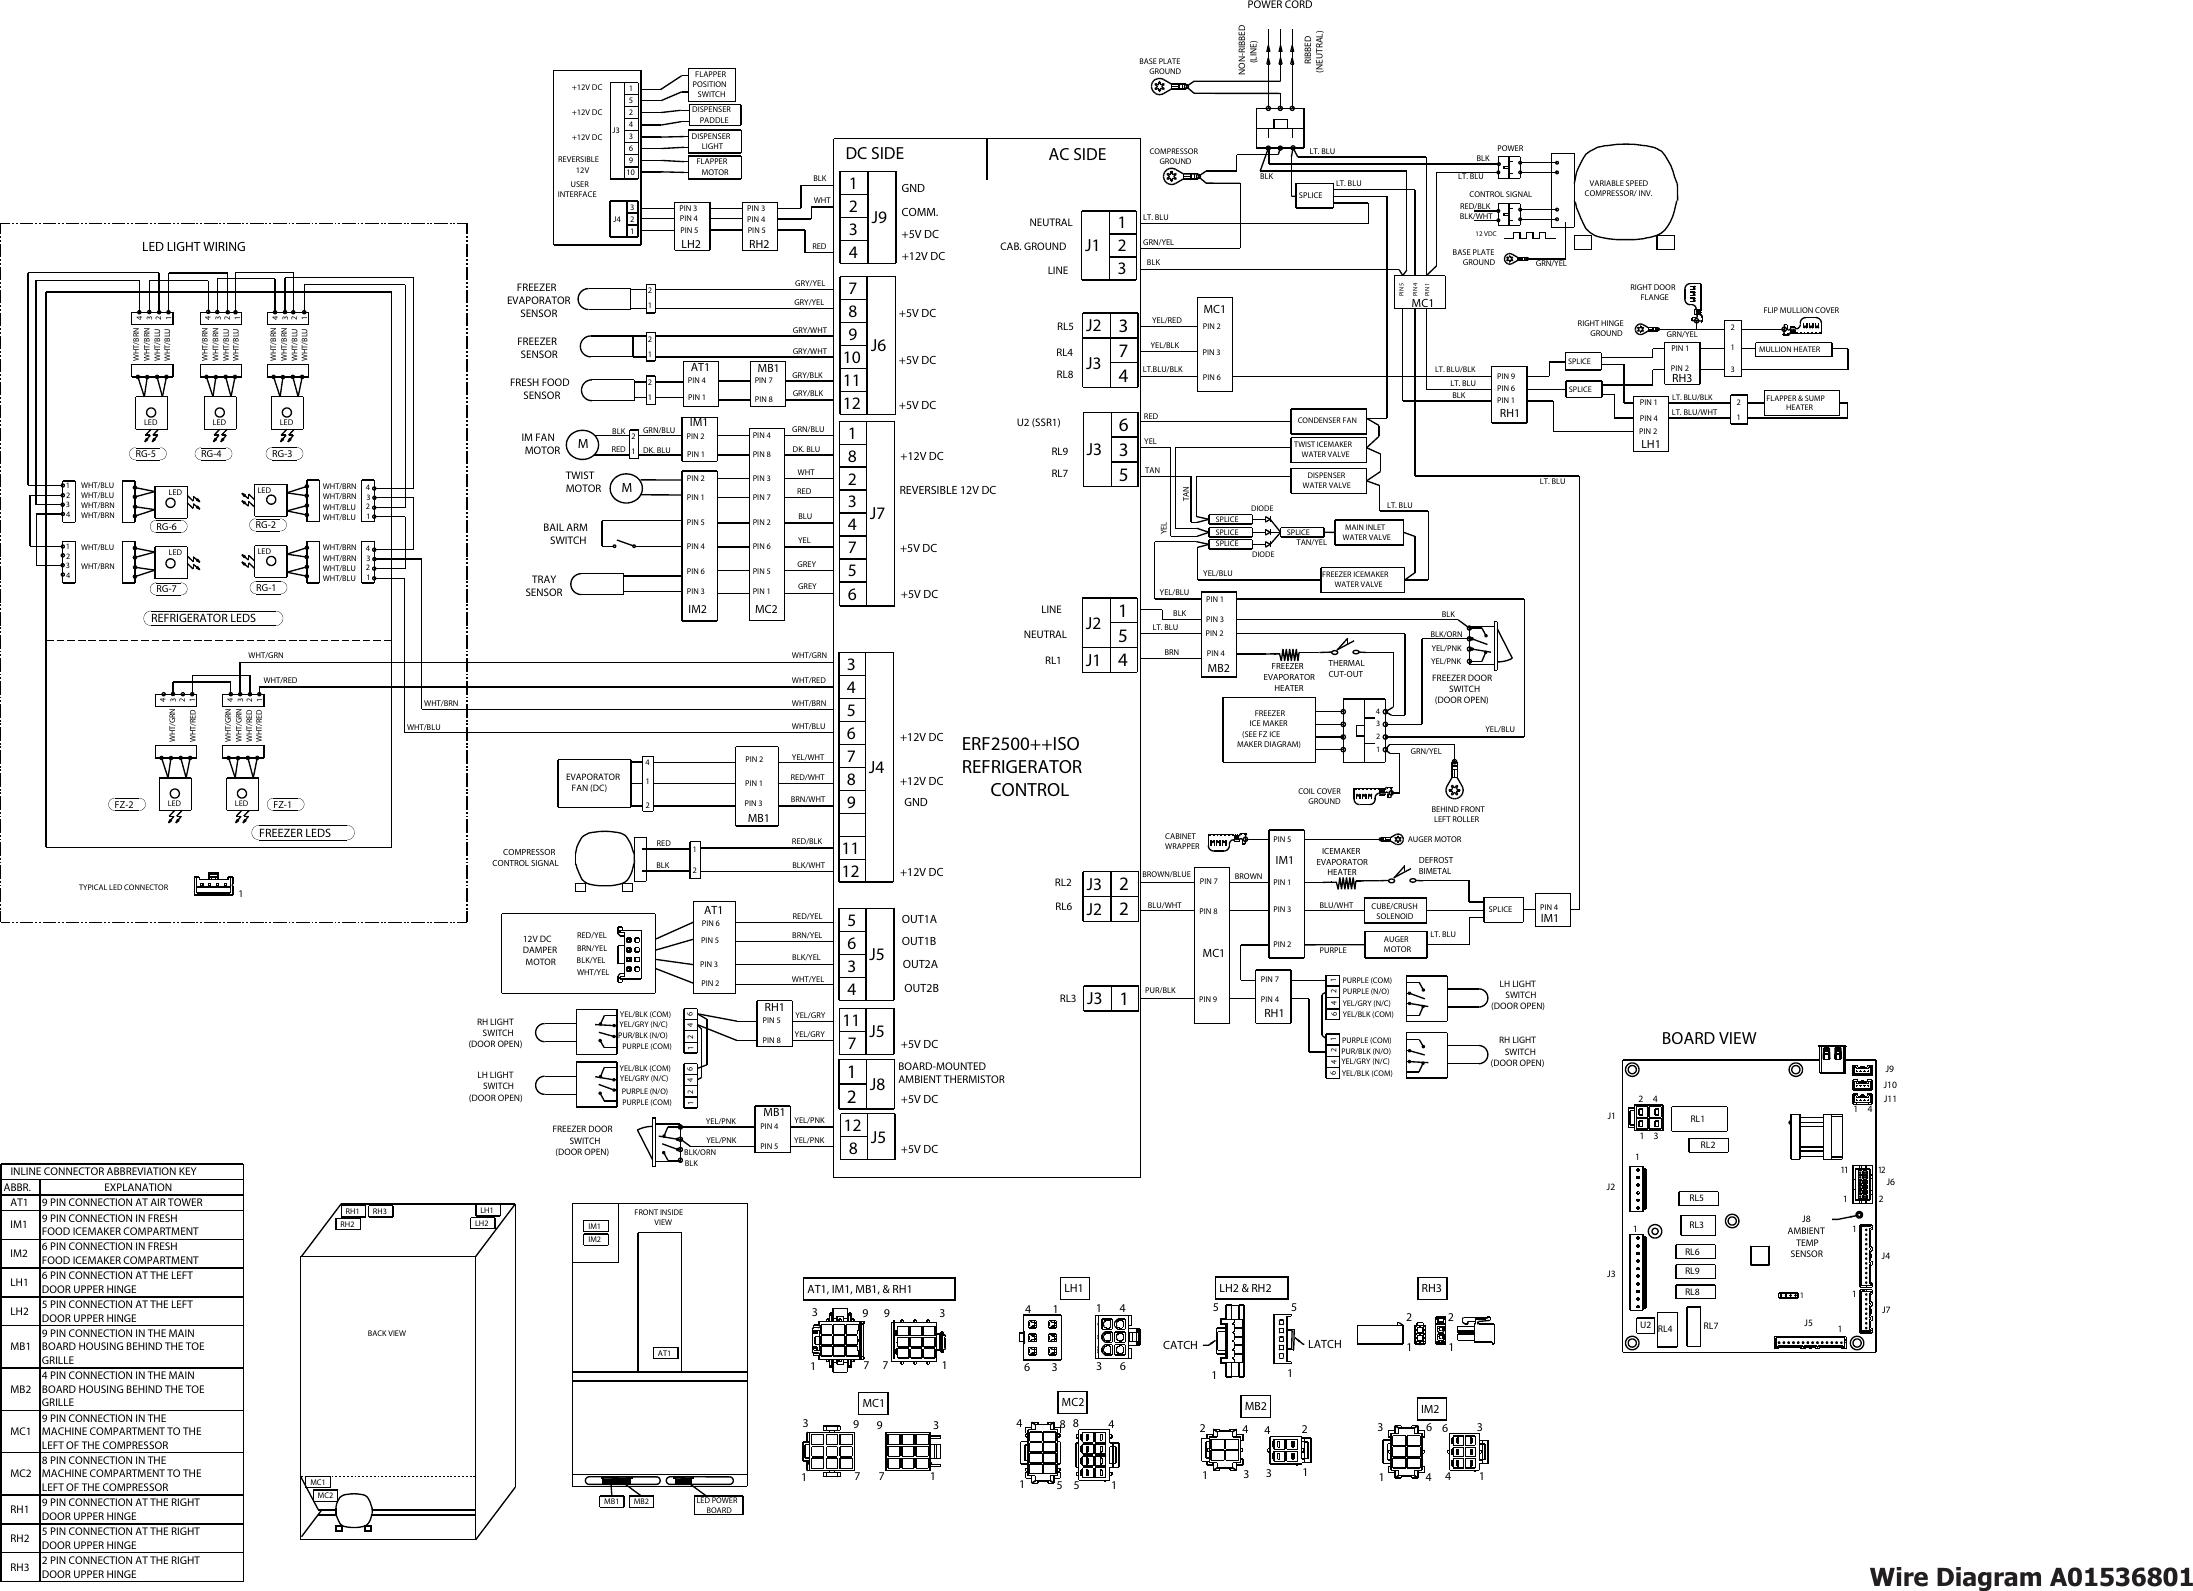 Frigidaire Fghb2866pe Wiring Diagram Schematics